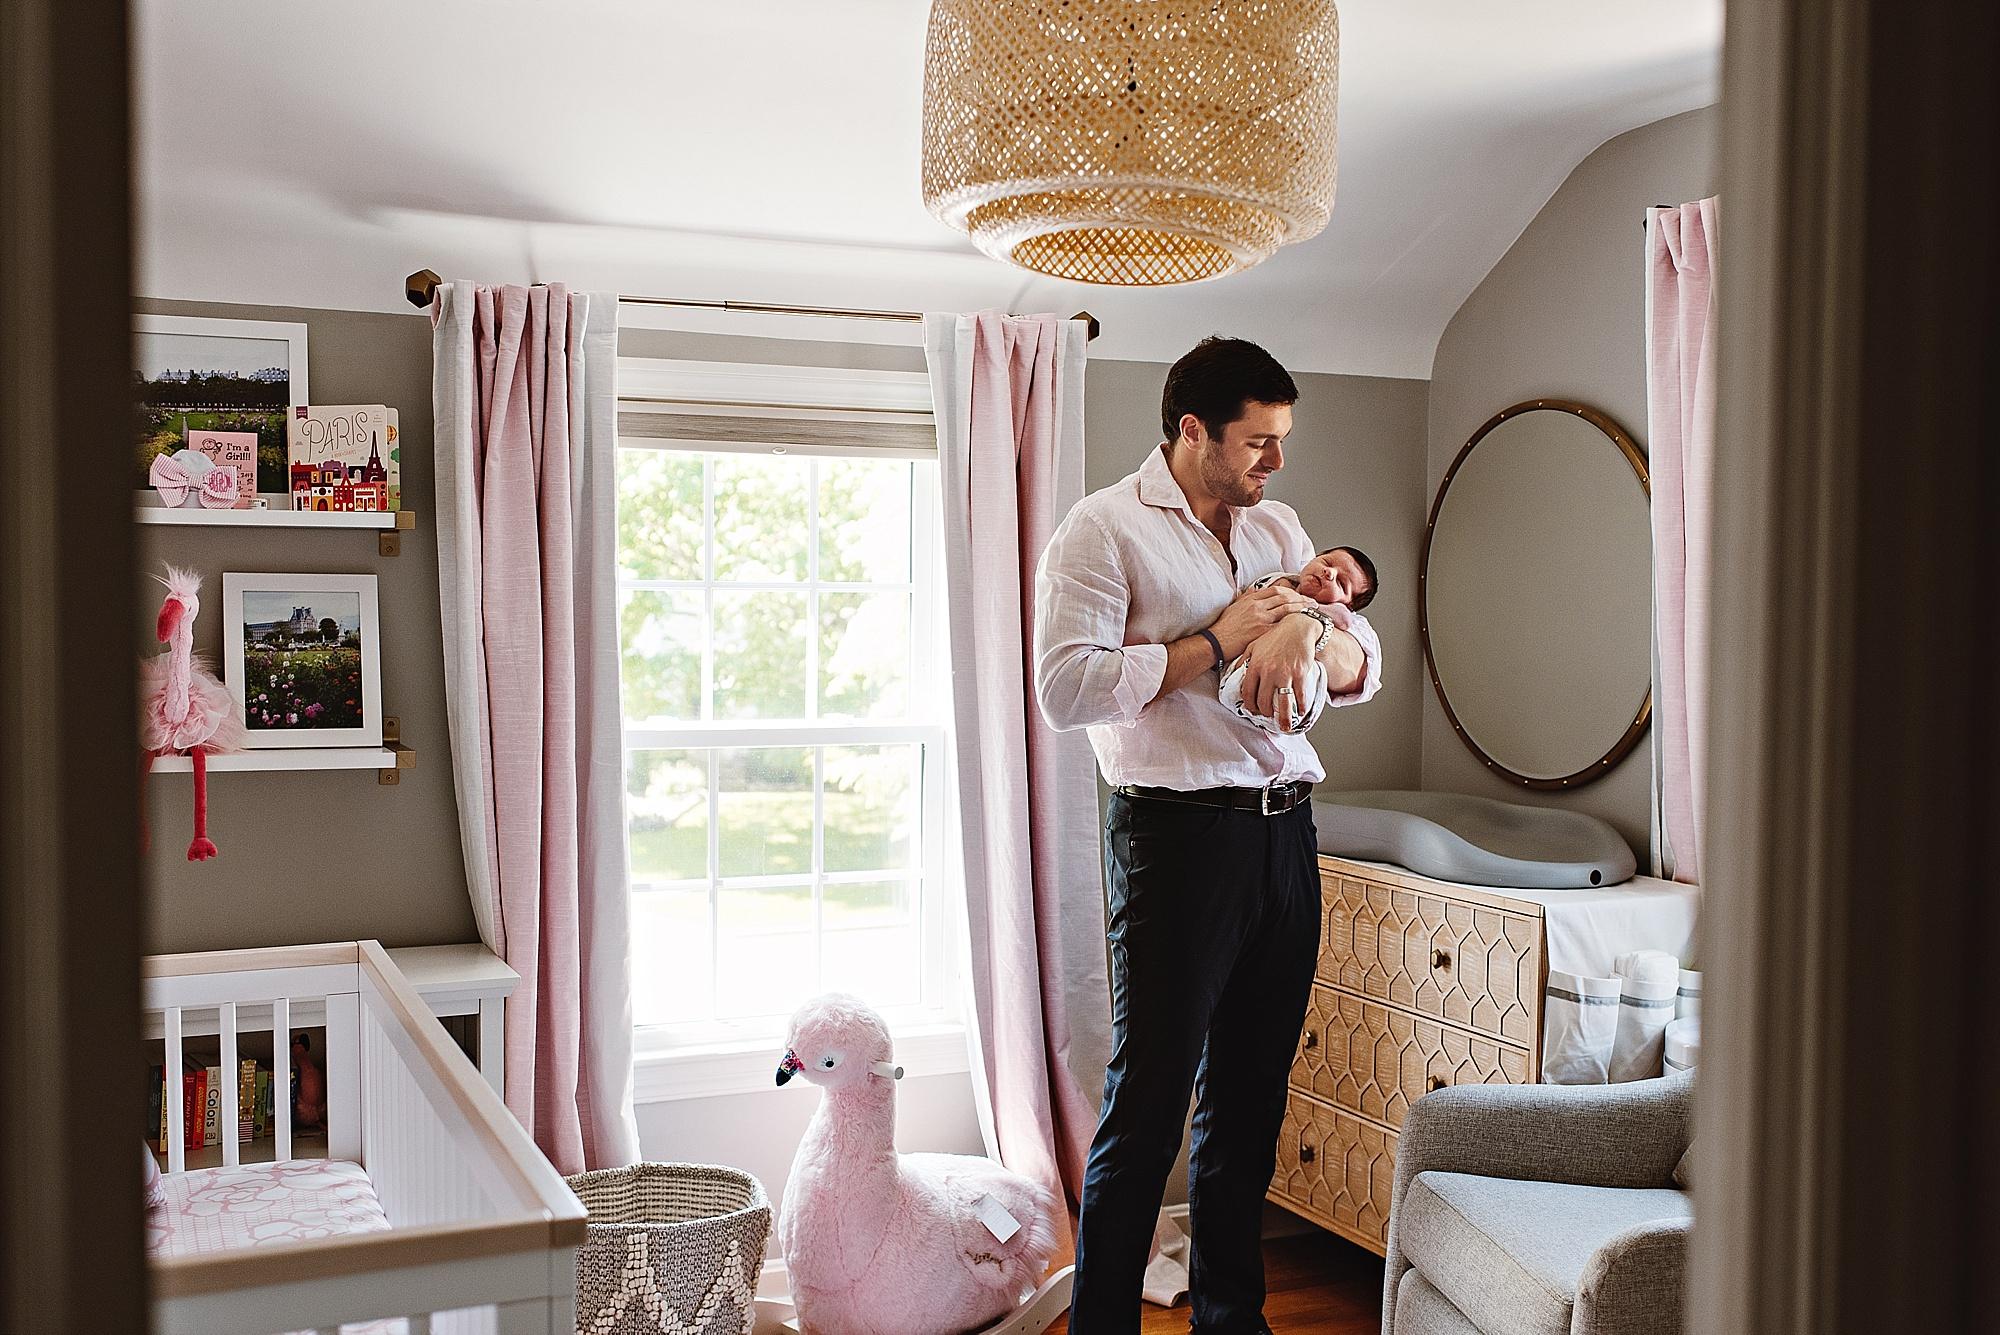 lauren-grayson-photography-cleveland-ohio-photographer-newborn-session-in-home-lifestyle-newborn-family-vivian_0648.jpg